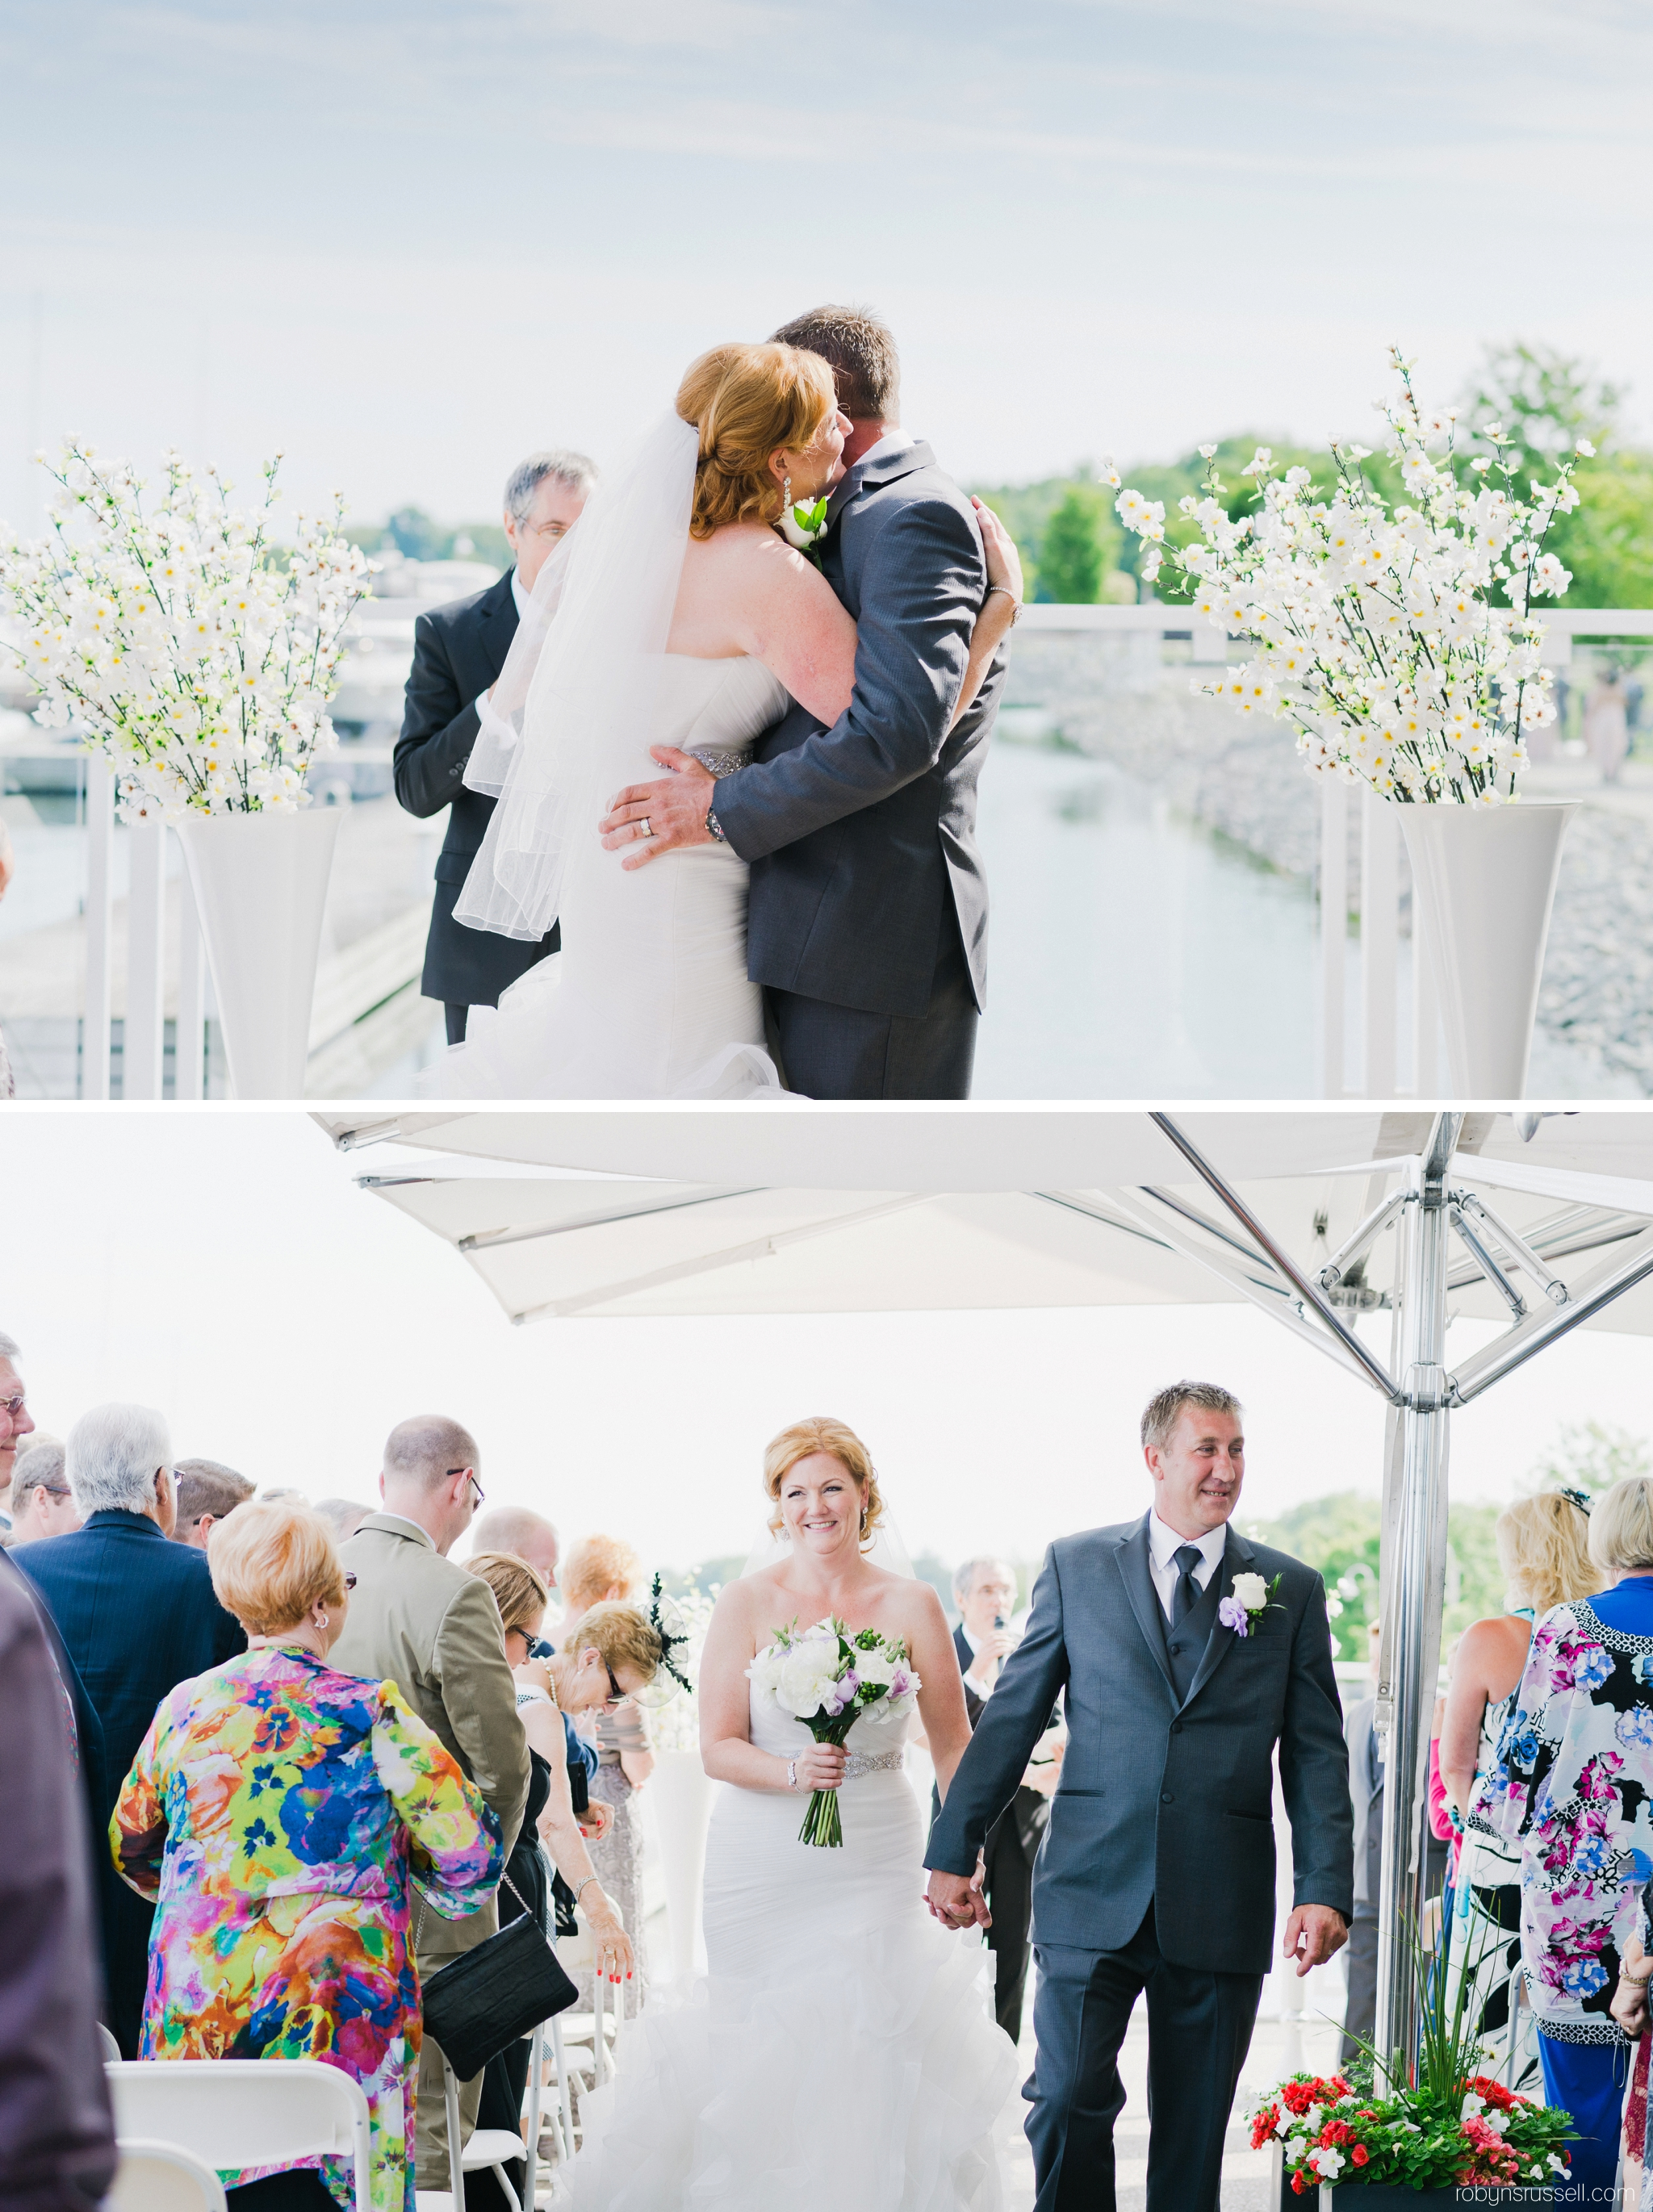 17-the-kiss-walking-down-the-aisle-oakville-wedding-photographer.jpg